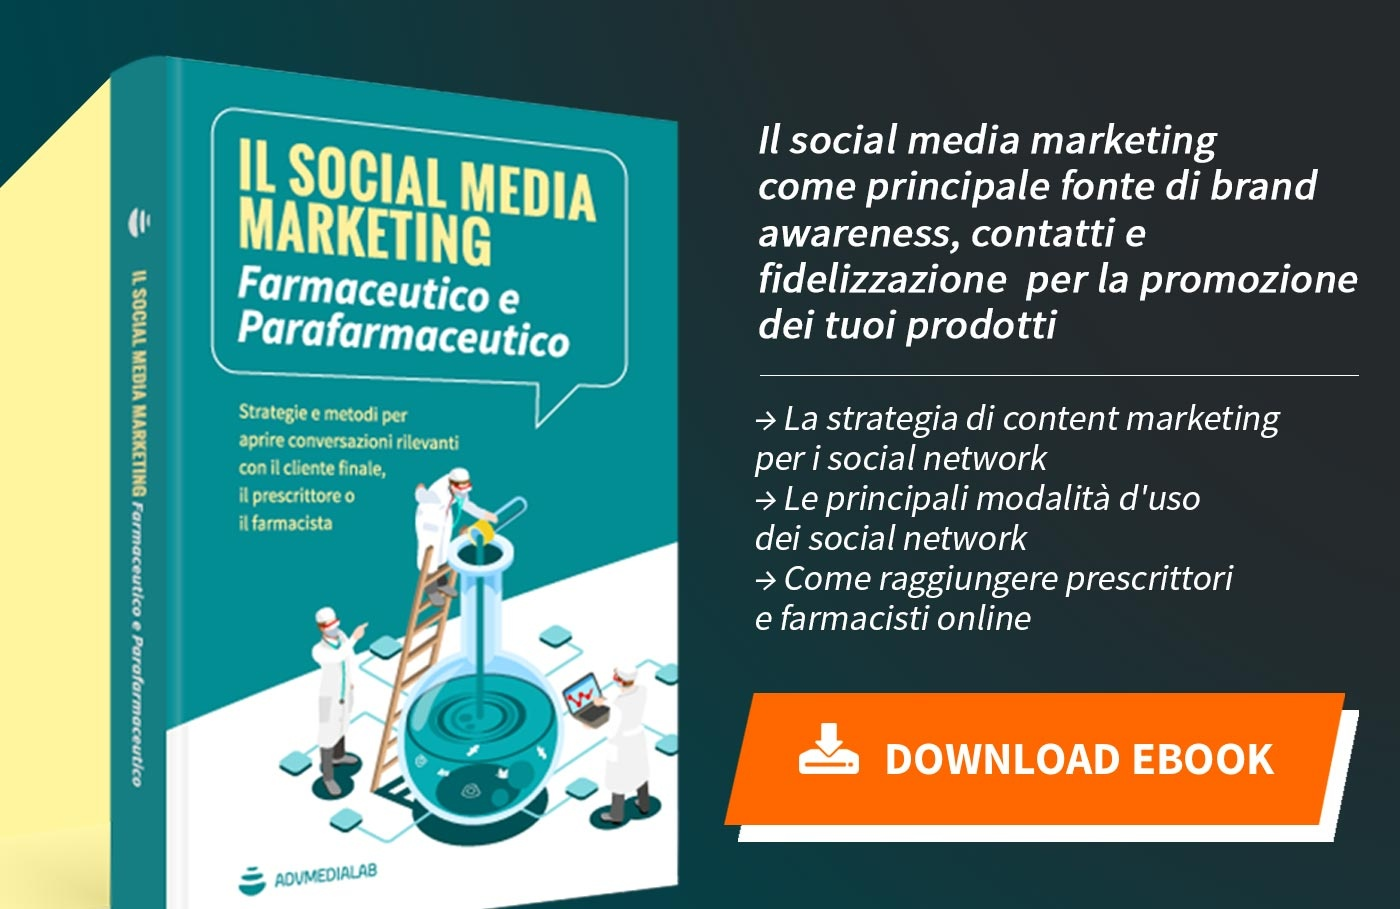 Scarica-ebook-social-media-marketing-farmaceutico-parafarmaceutico